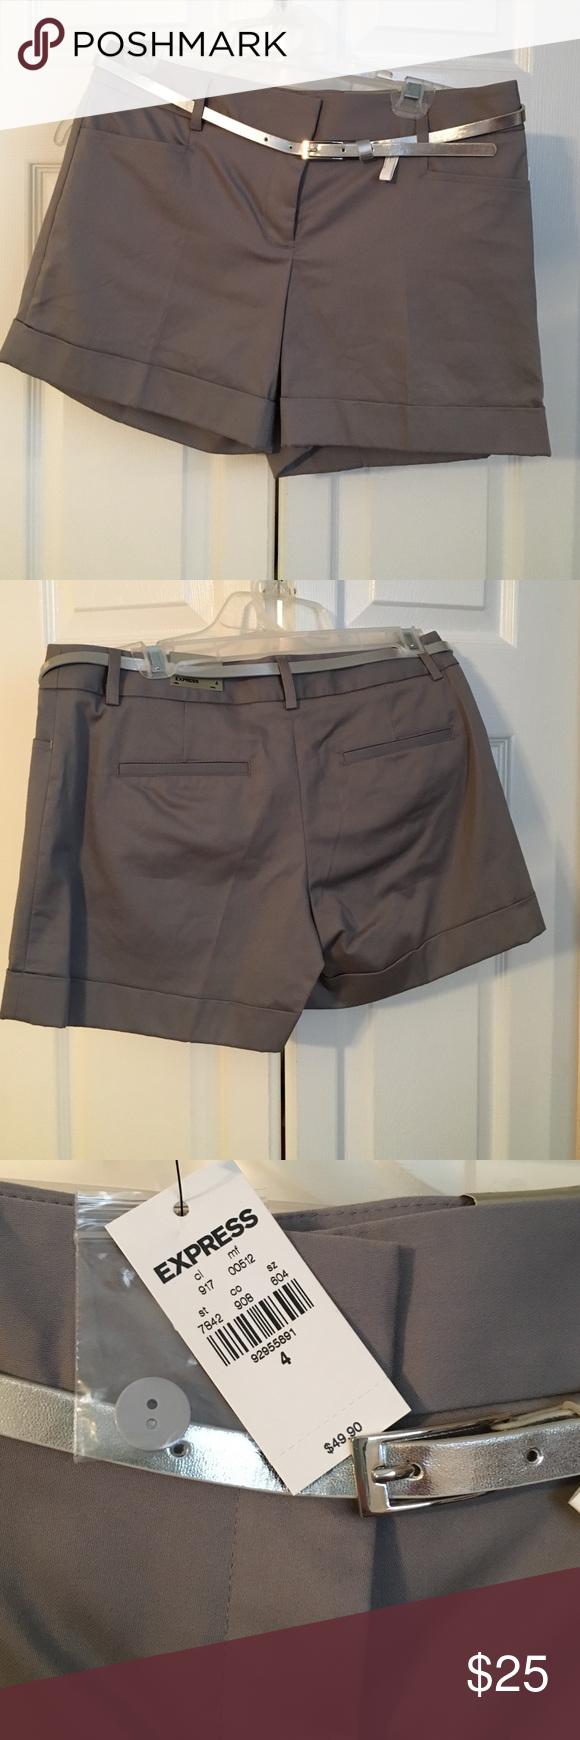 Express Editor Shorts NEVER BEEN WORN!!! Grey shorts with belt. Express Shorts